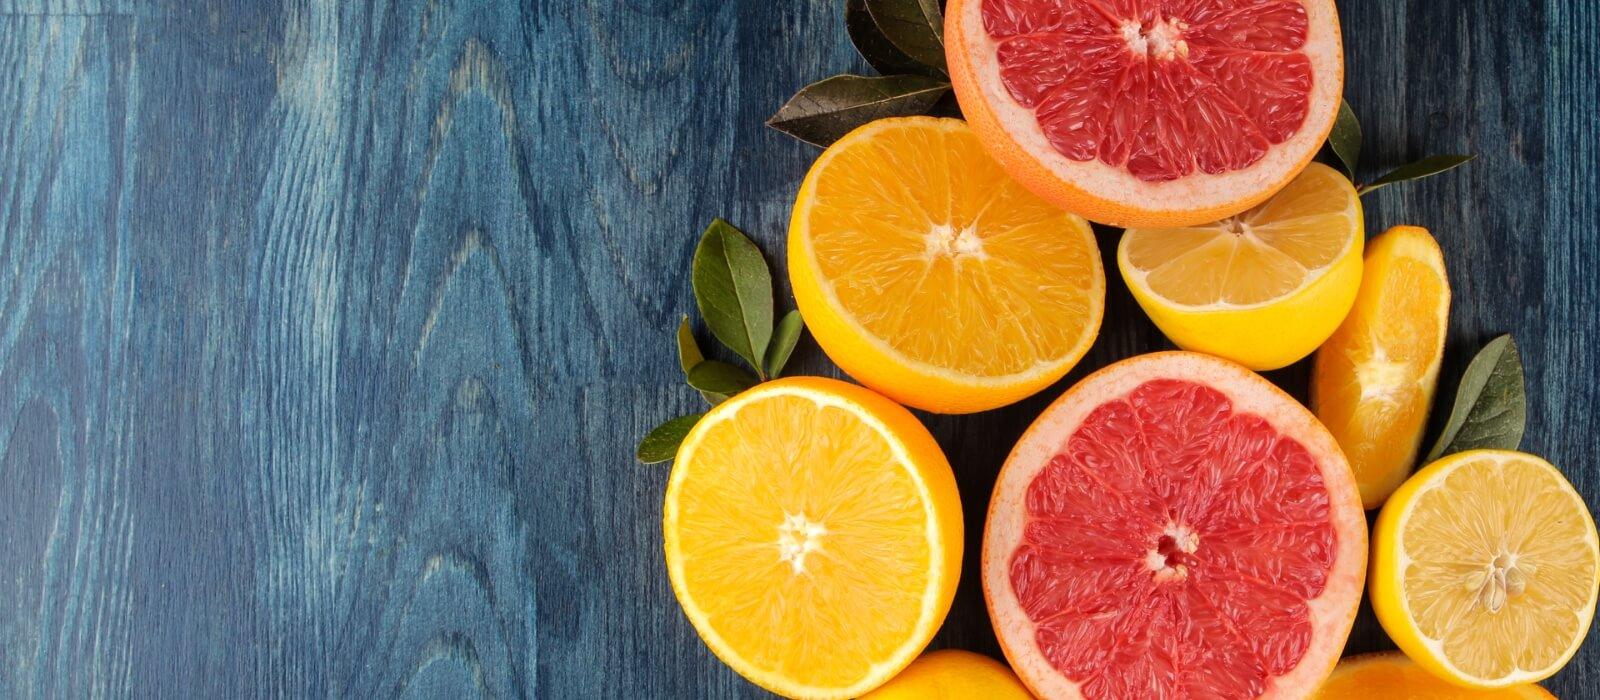 La revolución del CBD a partir de cáscara de naranja